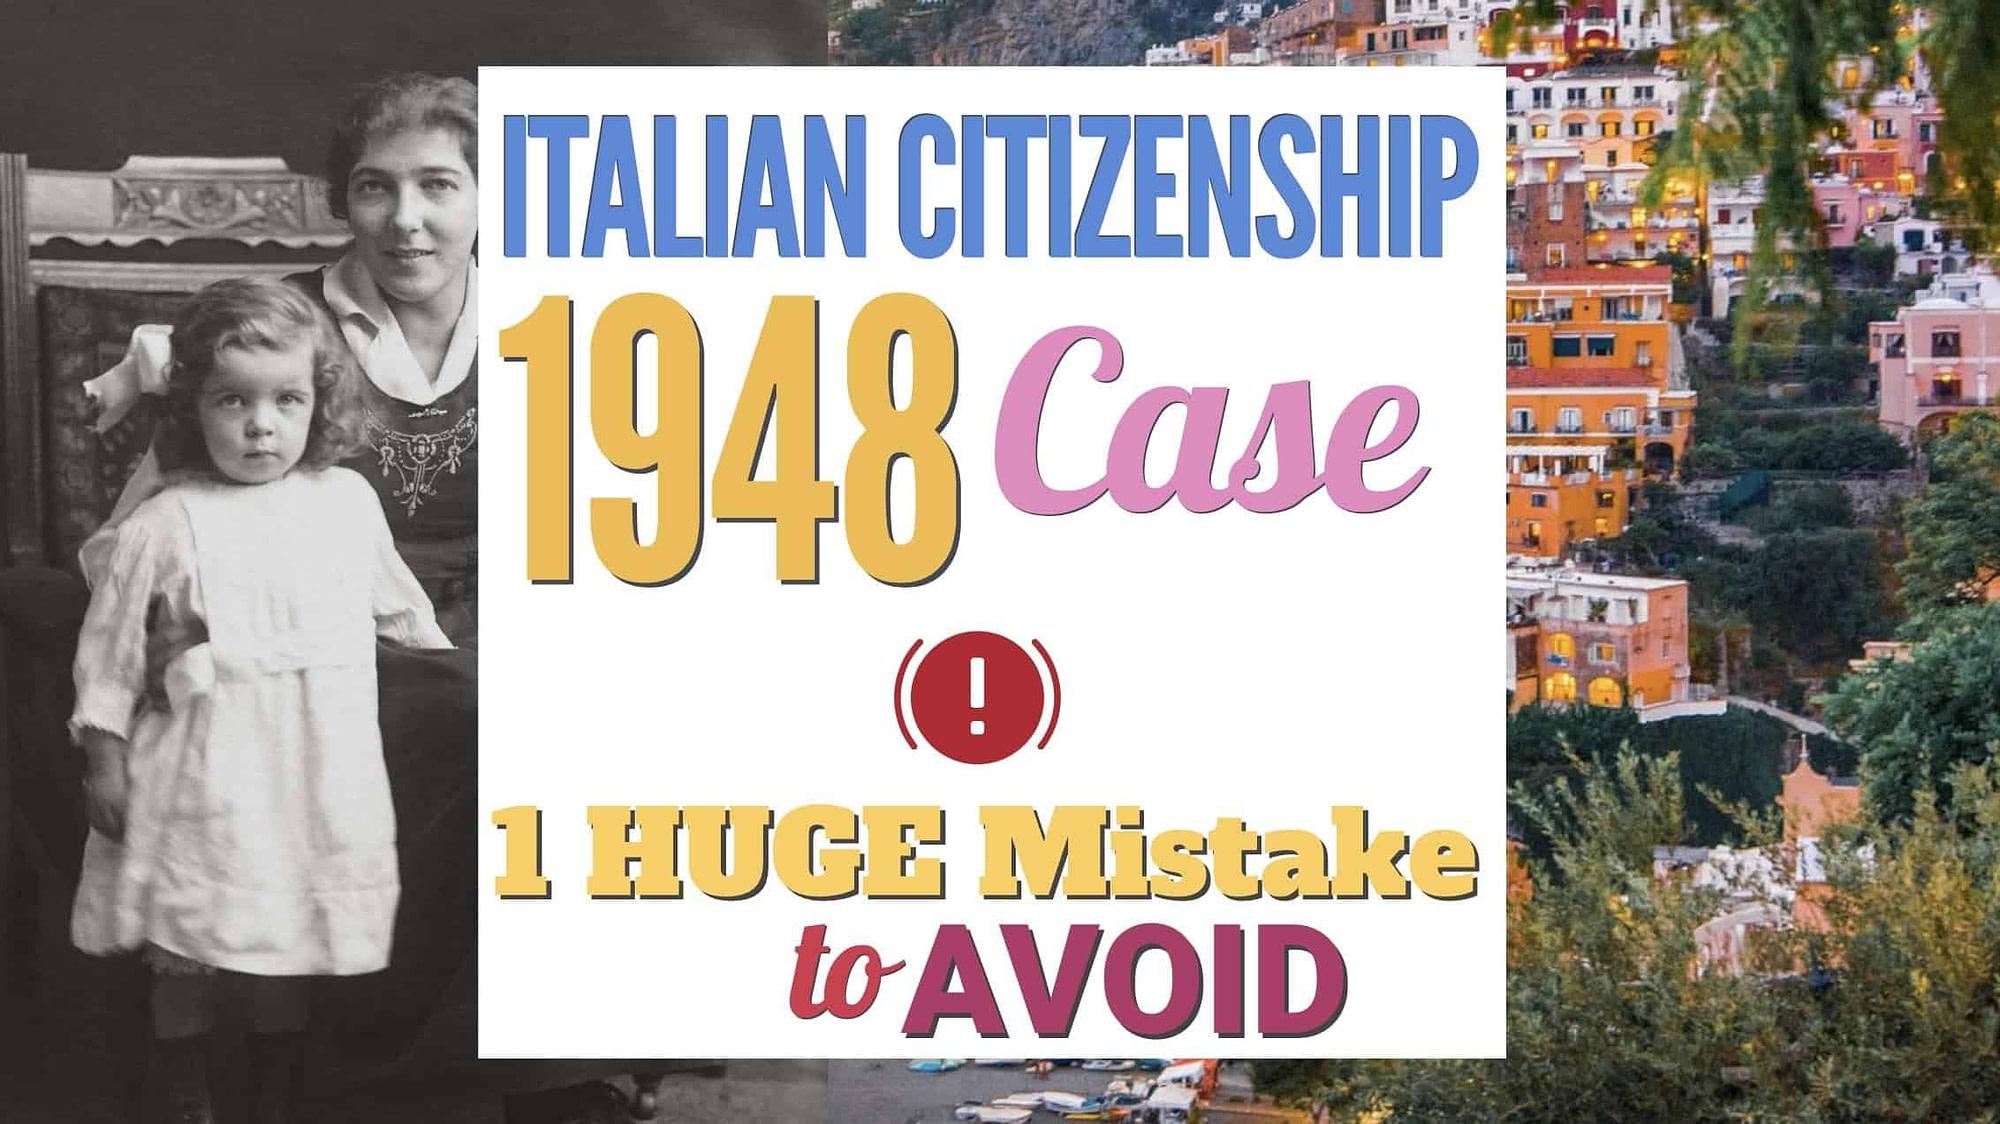 Italian-Citizenship-1948-Case-1948-case-italian-citizenship-1948-rule-maternal-line-italian-citizenship-maternal-line-italian-citizenship-1948-case-italian-citizenship-through-female-italian-citizeship-jure-sanguinis-boost-italian-citizenship-by-descent-italian-citizenship-processing-time-speed-up-italian-citizenship-by-descent-processing-time-italian-citizenship-assistance-italian-dual-citizenship-lawyer-italian-citizenship-service-italian-citizenship-jure-sanguinis-assistance-boost-italian-citizenship-processing-time